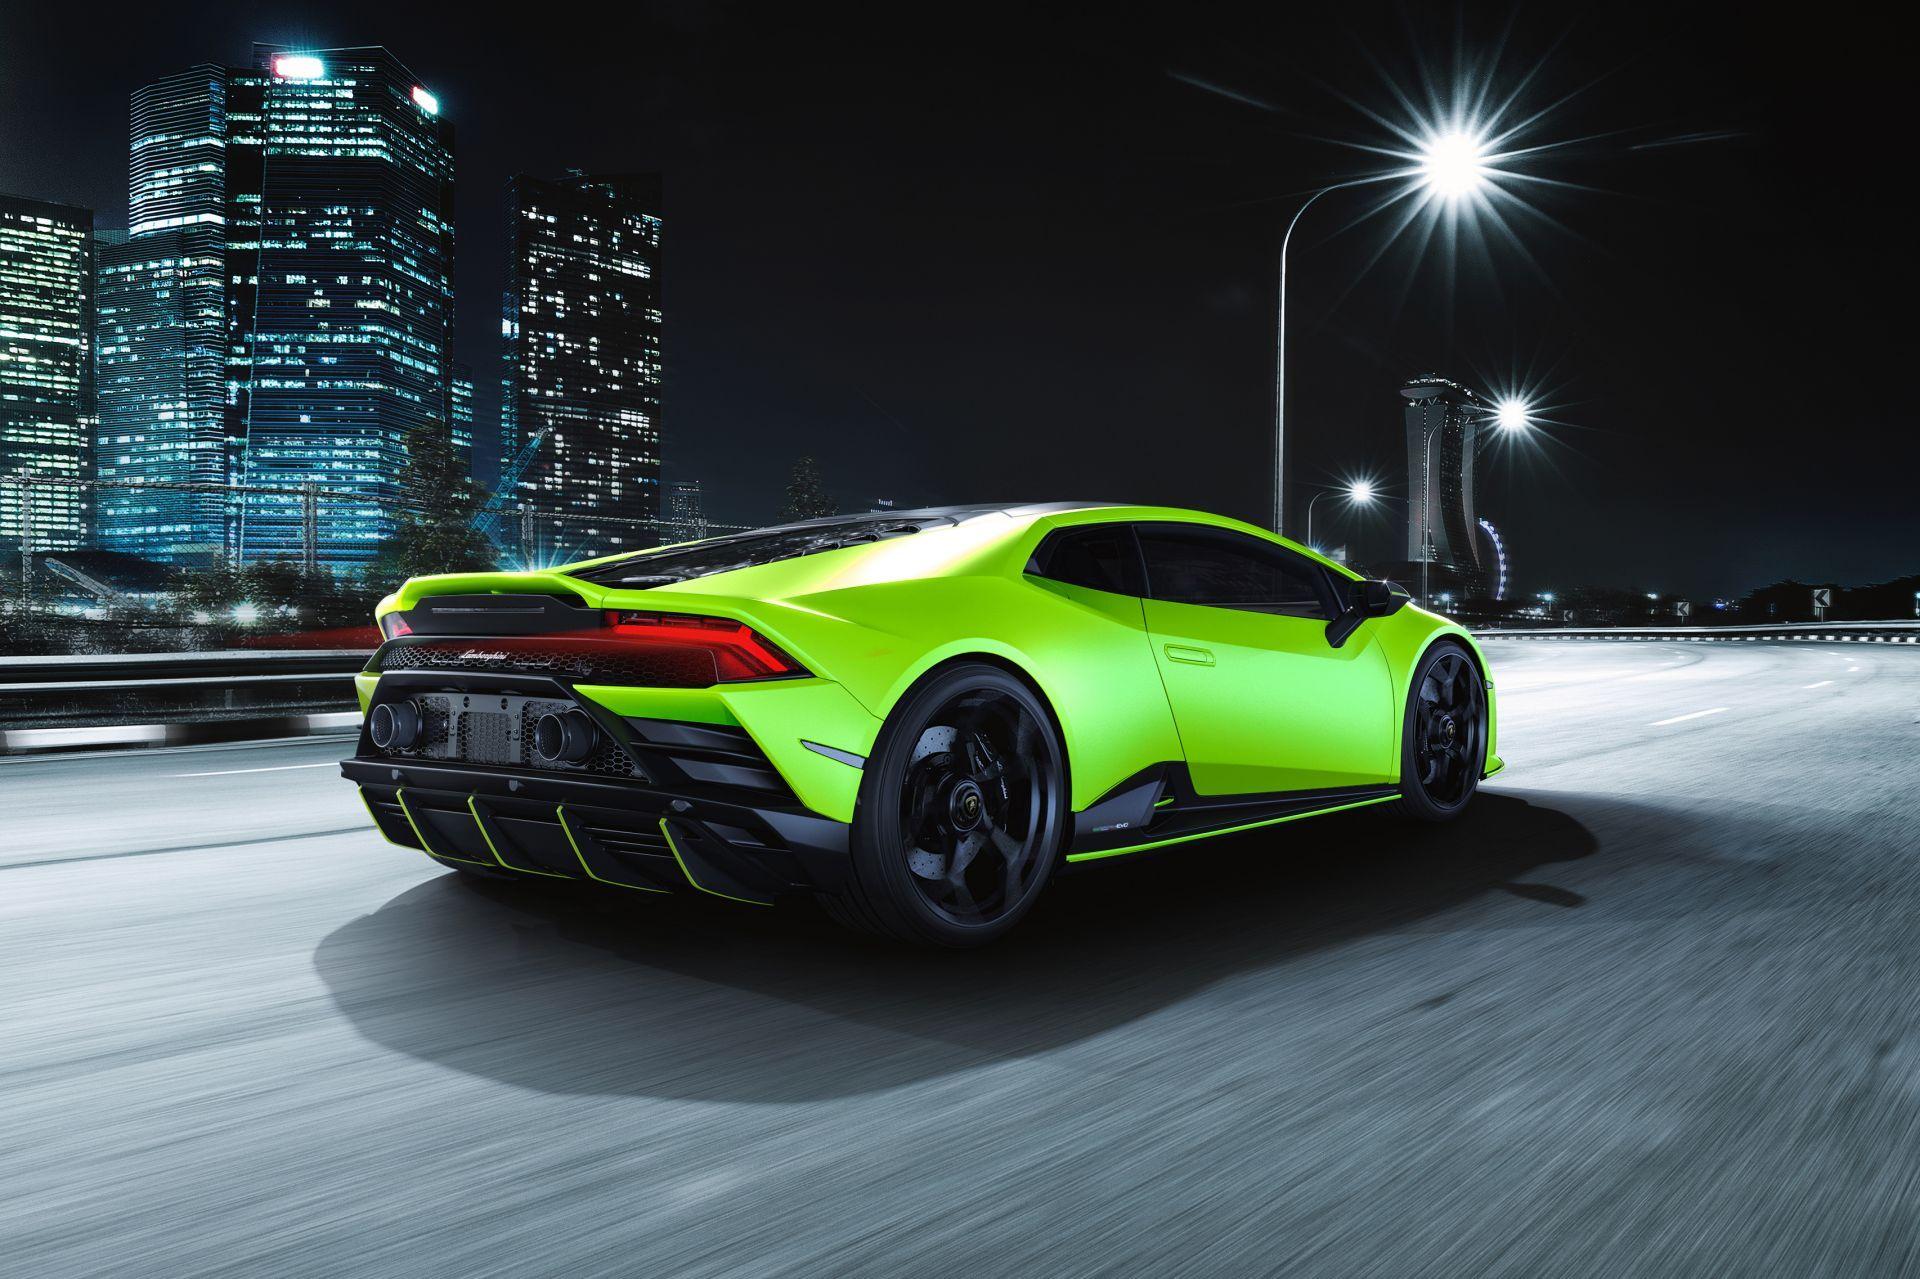 Lamborghini-Huracan-Evo-Fluo-Capsule-16